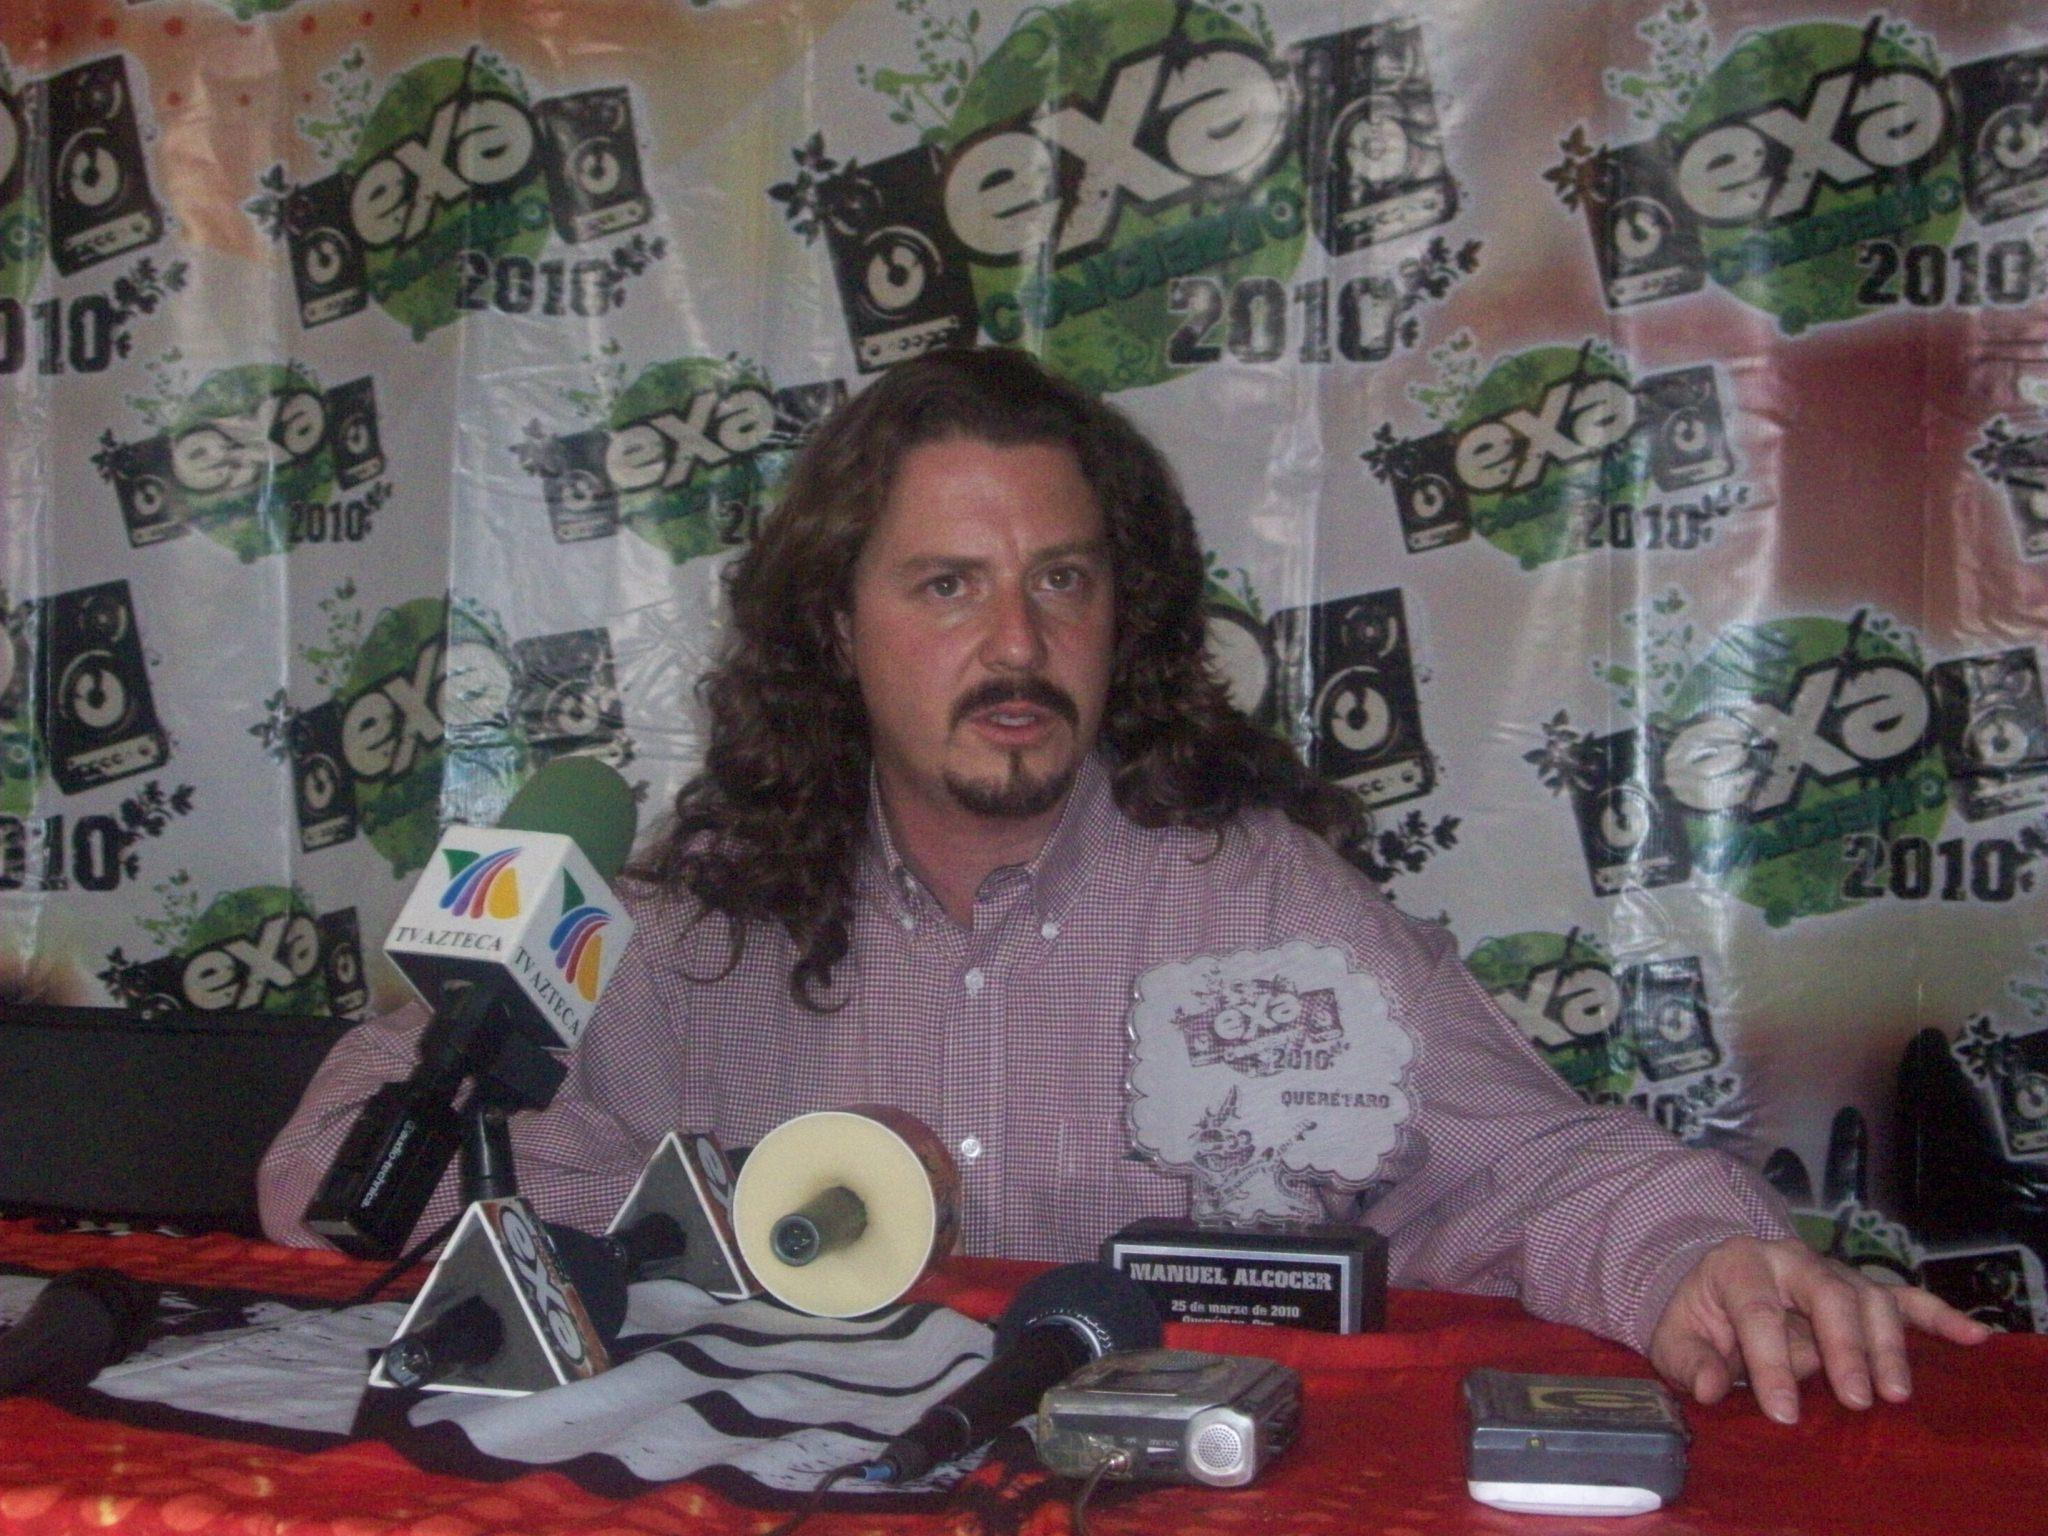 Manuel Alcocer